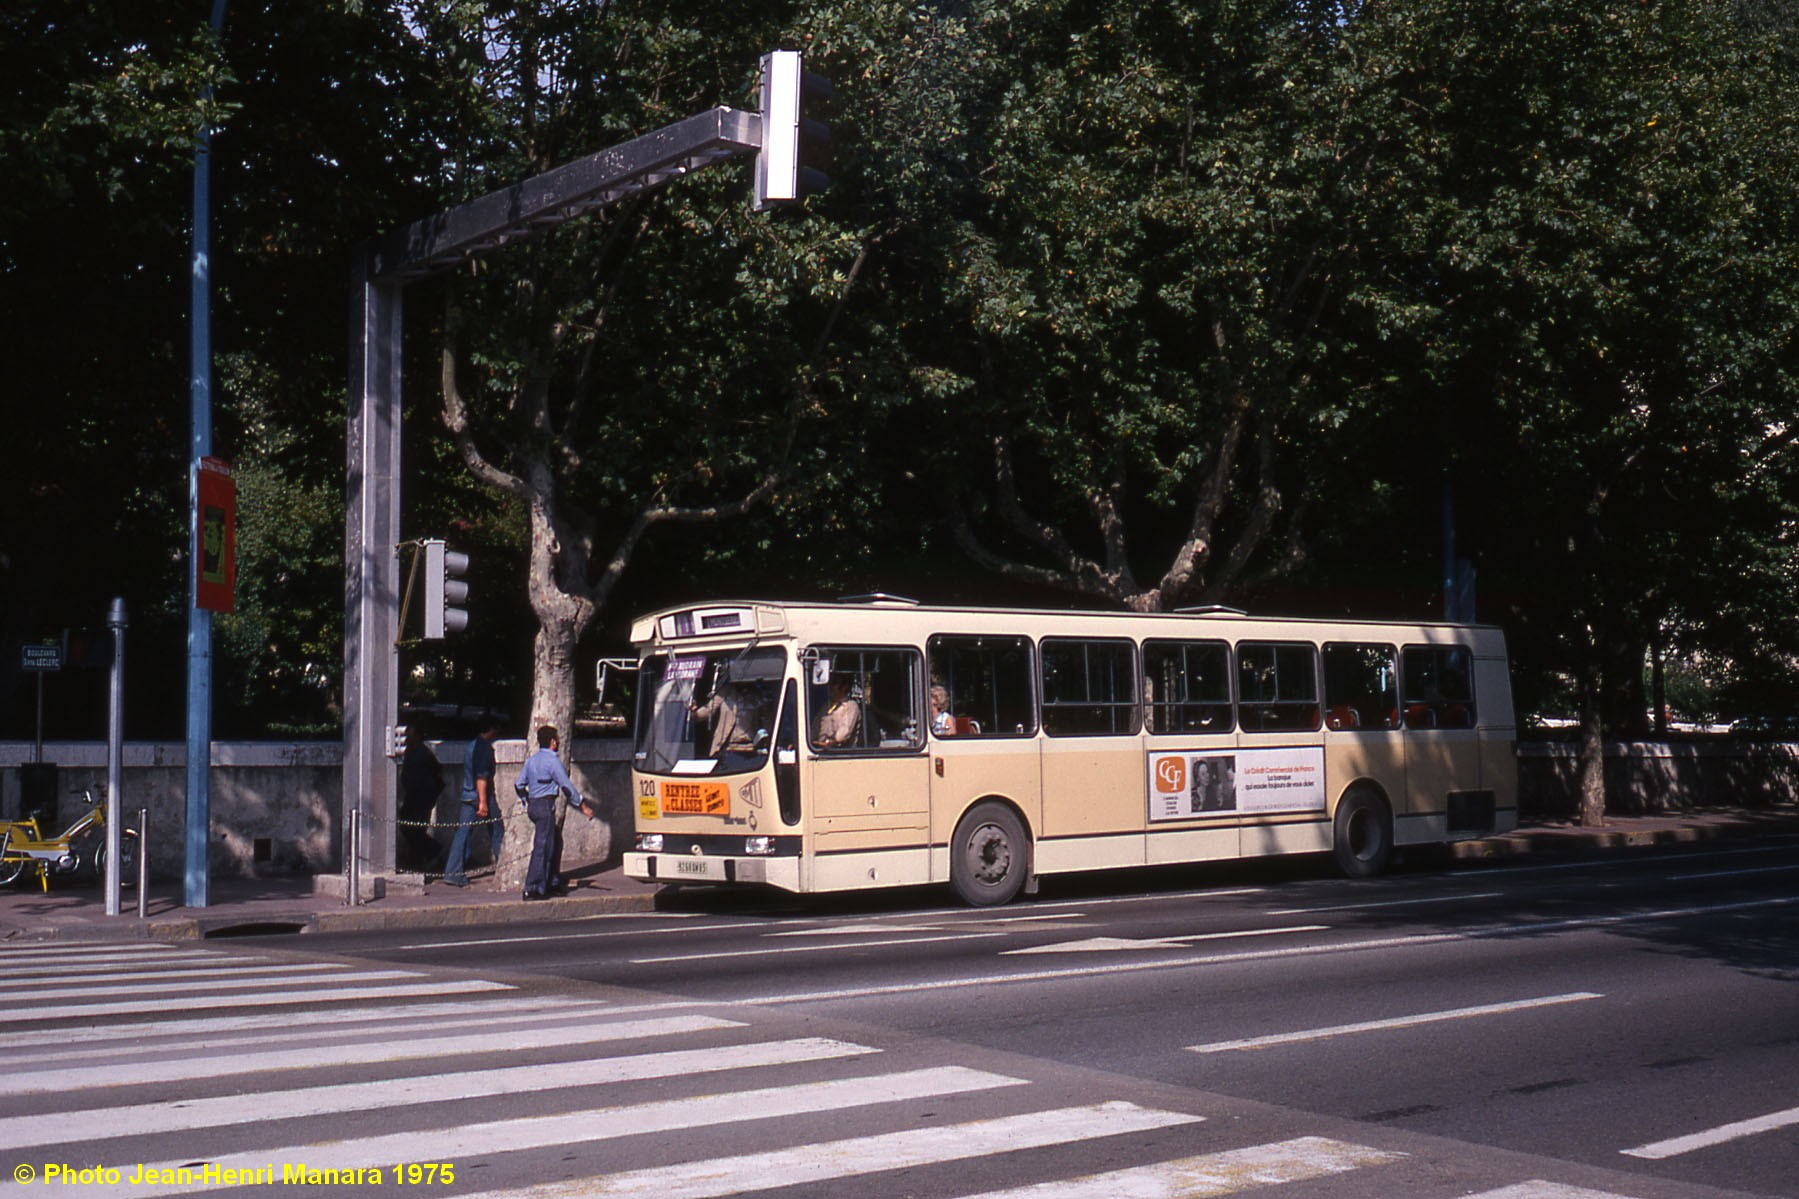 transport mobilit urbaine afficher le sujet on a retrouv le 52. Black Bedroom Furniture Sets. Home Design Ideas